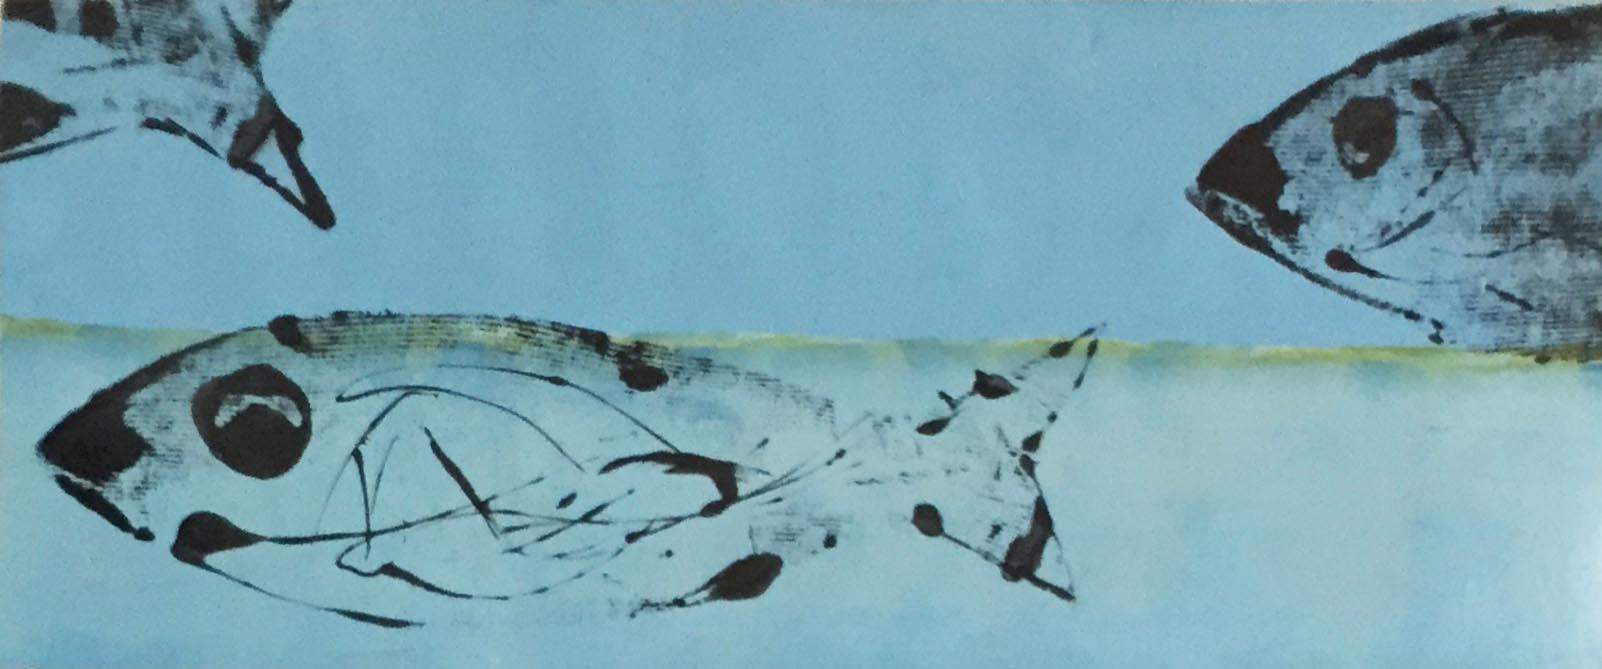 "SOLD| PILGRIM LAKE II, 12"" x 30"", OIL AND ENAMEL ON PANEL"